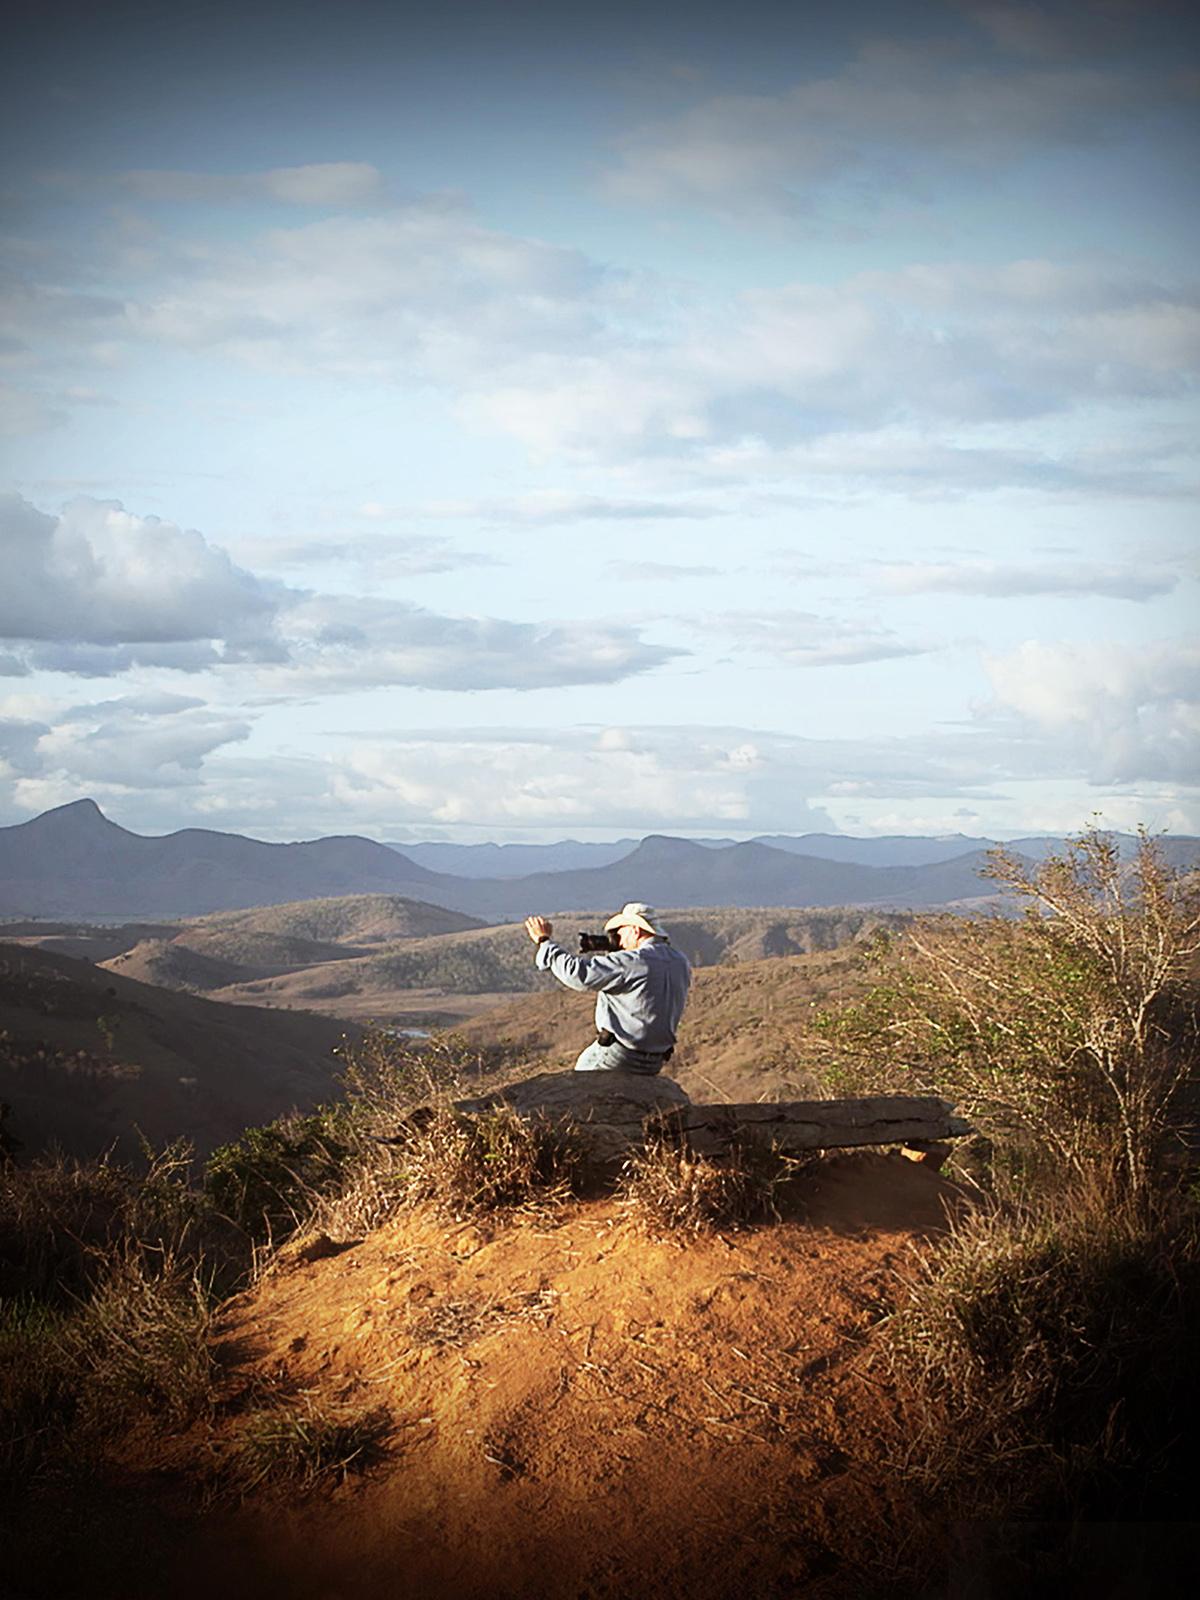 Foto de sebasti o salgado no filme o sal da terra foto 4 de 7 adorocinema - Fotos terras ...